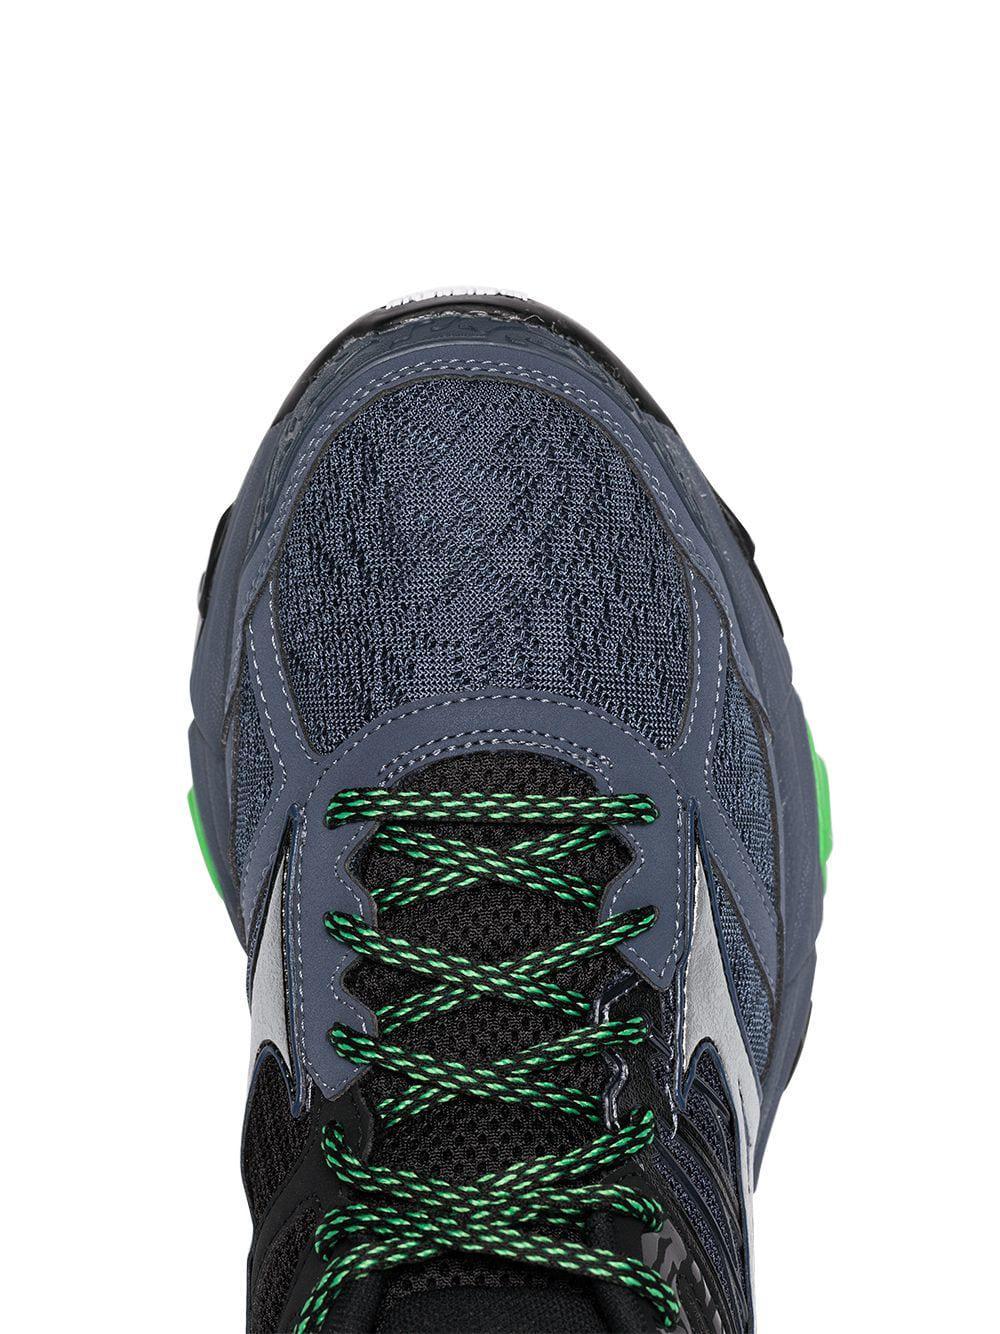 ce9e599368d6 For Men Mizuno Lyst Muji In 5 Wave Black Sneakers 0ZZdx8q